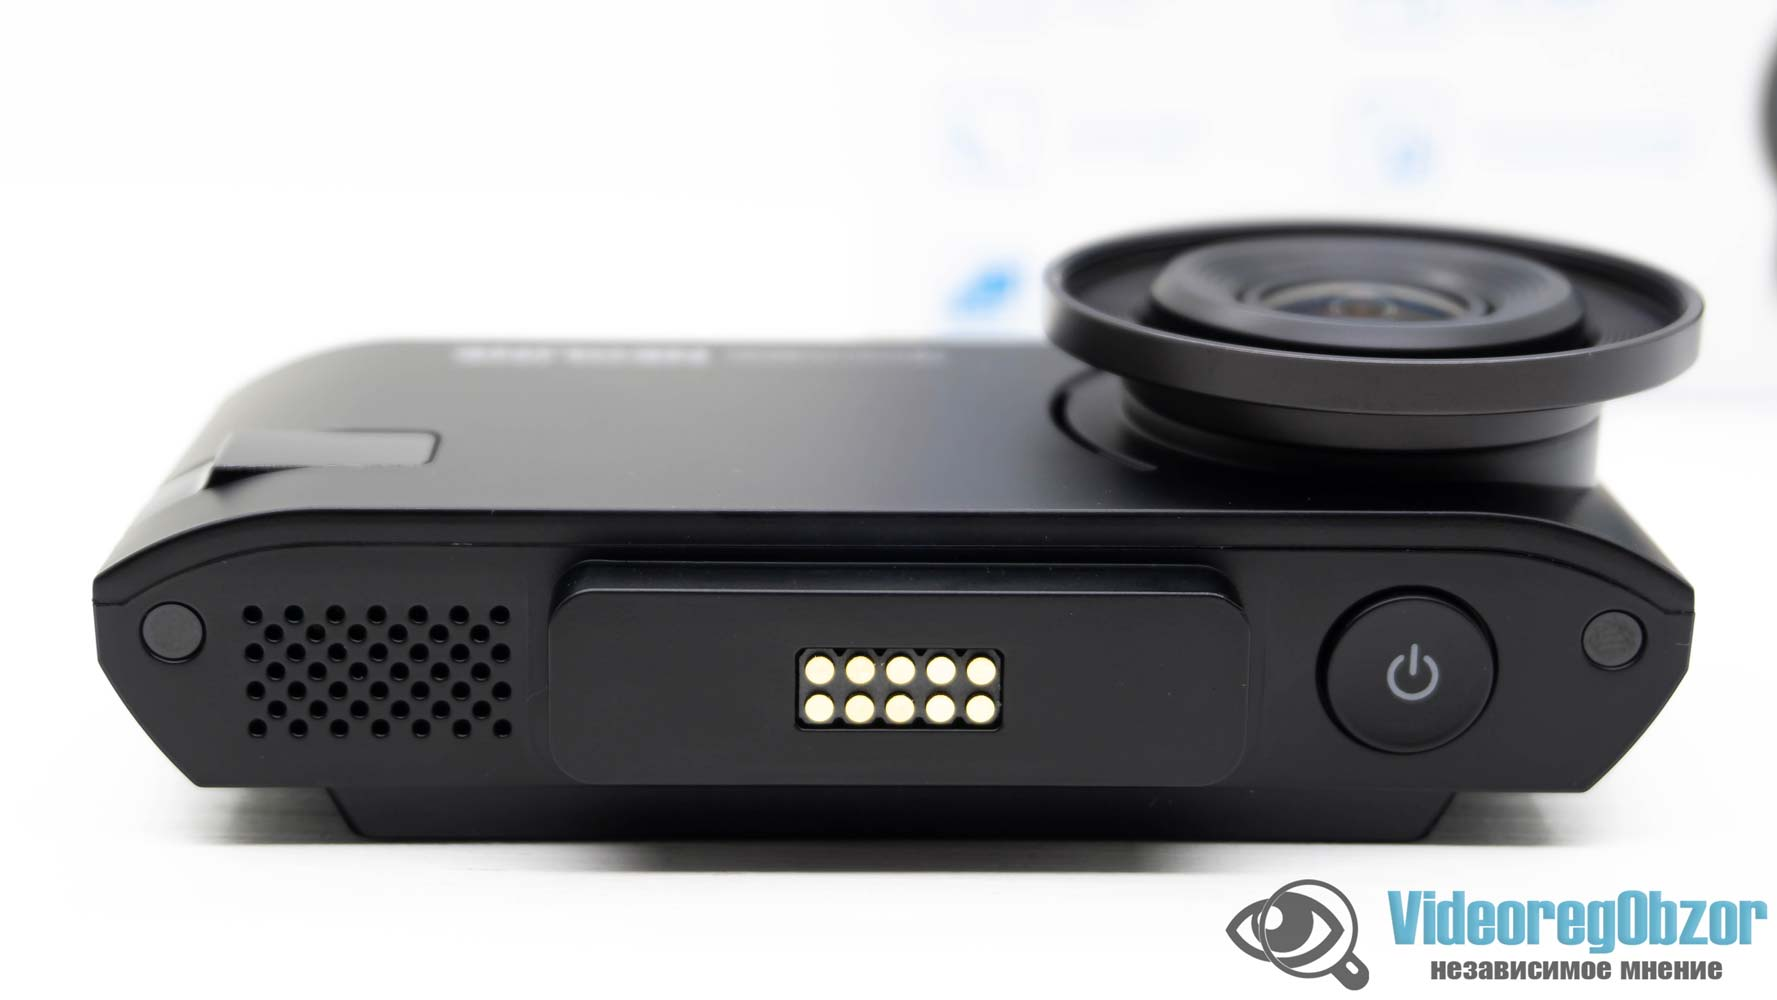 Neoline X COP 9200 обзор 18 VideoregObzor Neoline X-COP 9200: обзор видеорегистратора с радар-детектором